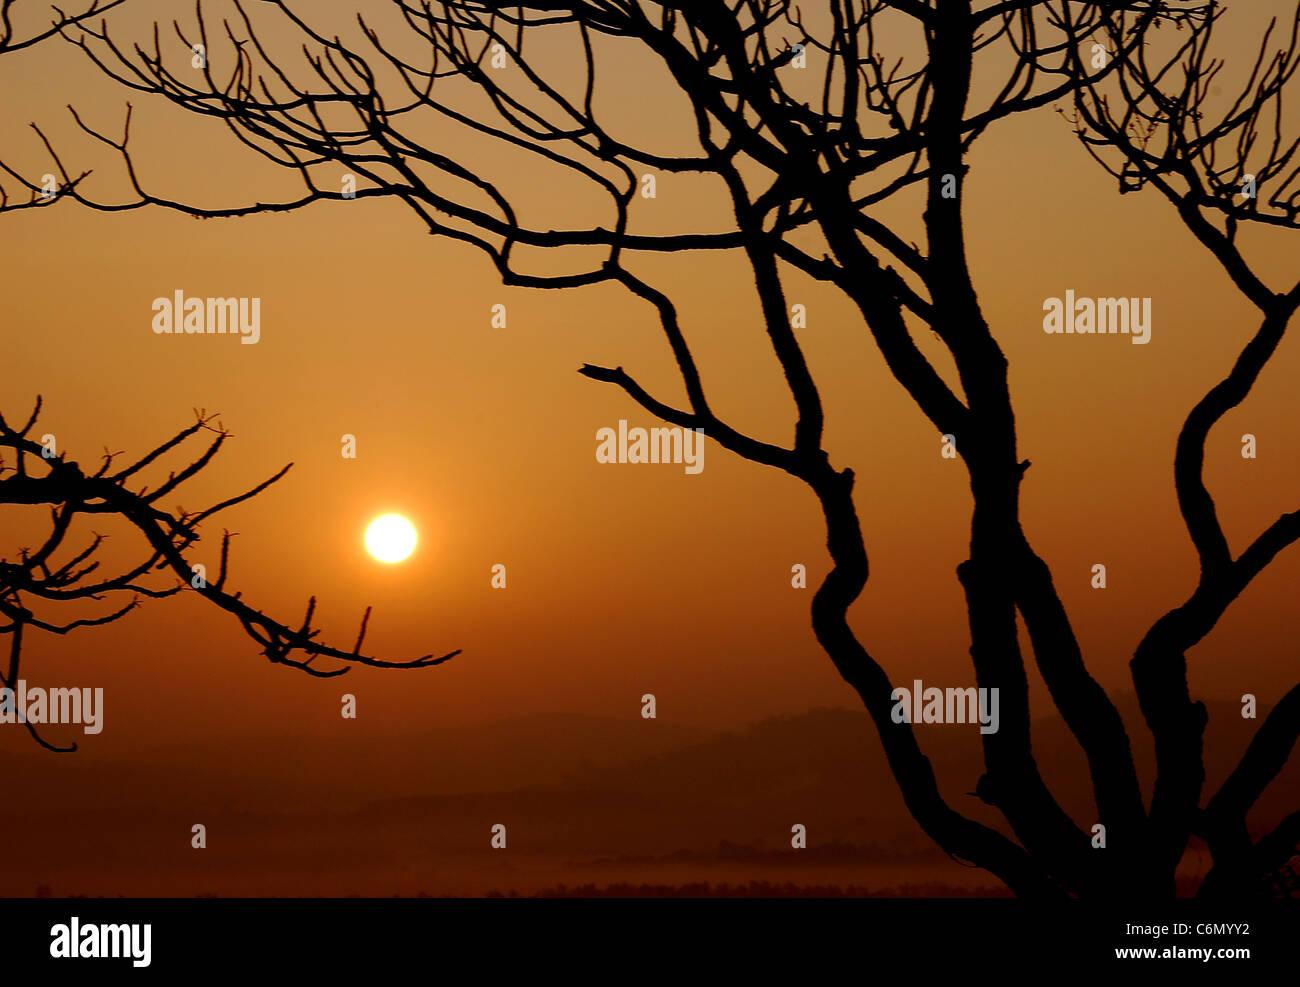 sun rise - Stock Image